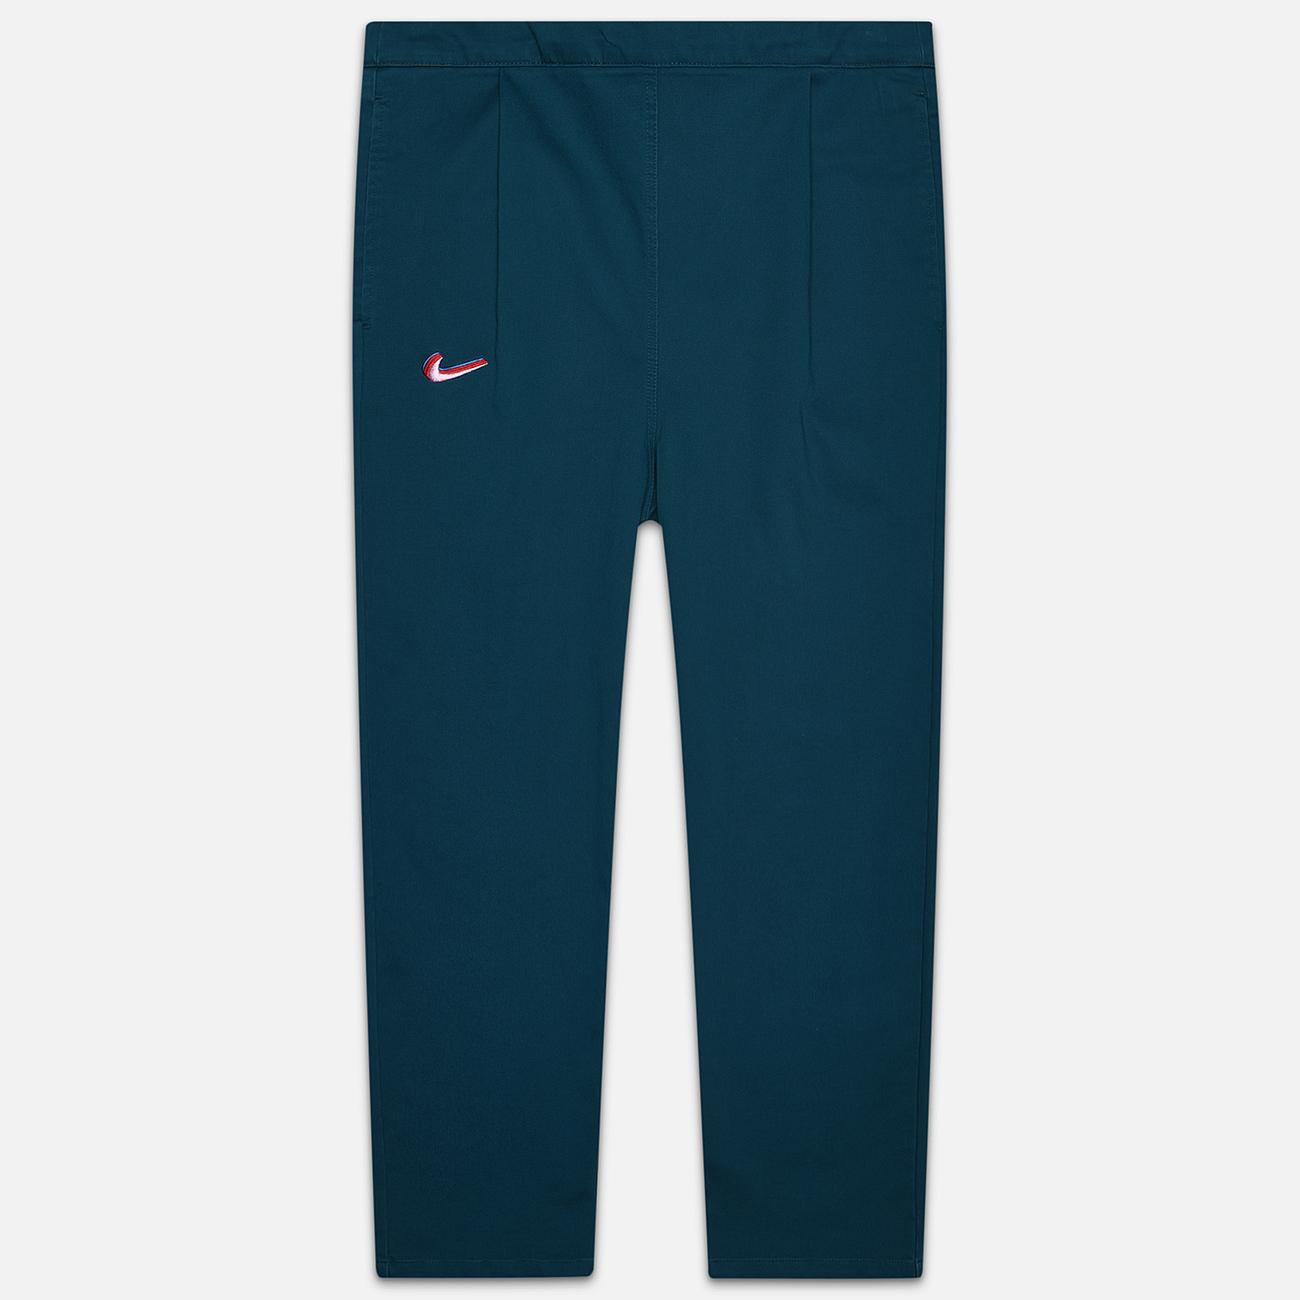 Мужские брюки Nike SB x Parra QS Solid Midnight Turq/Pink Rise